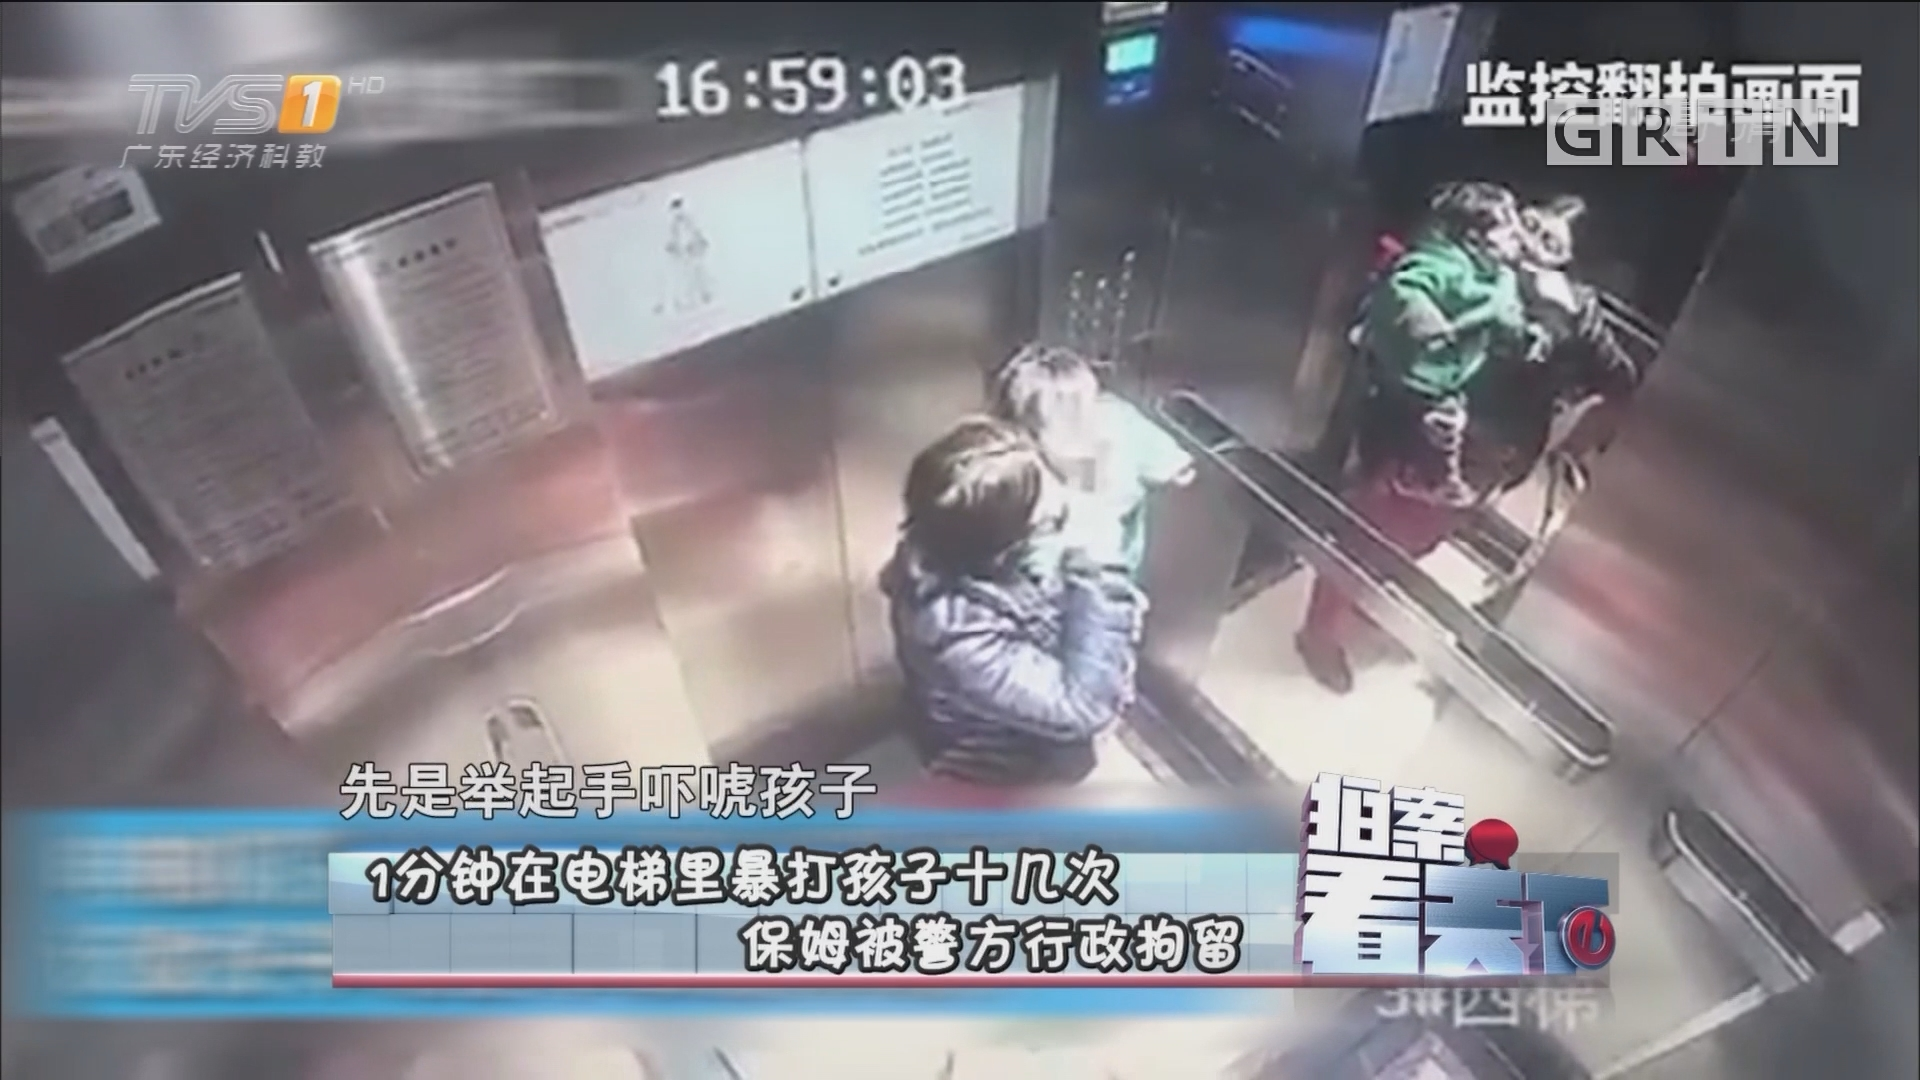 [HD][2017-12-11]拍案看天下:1分钟在电梯里暴打孩子十几次 保姆被警方行政拘留